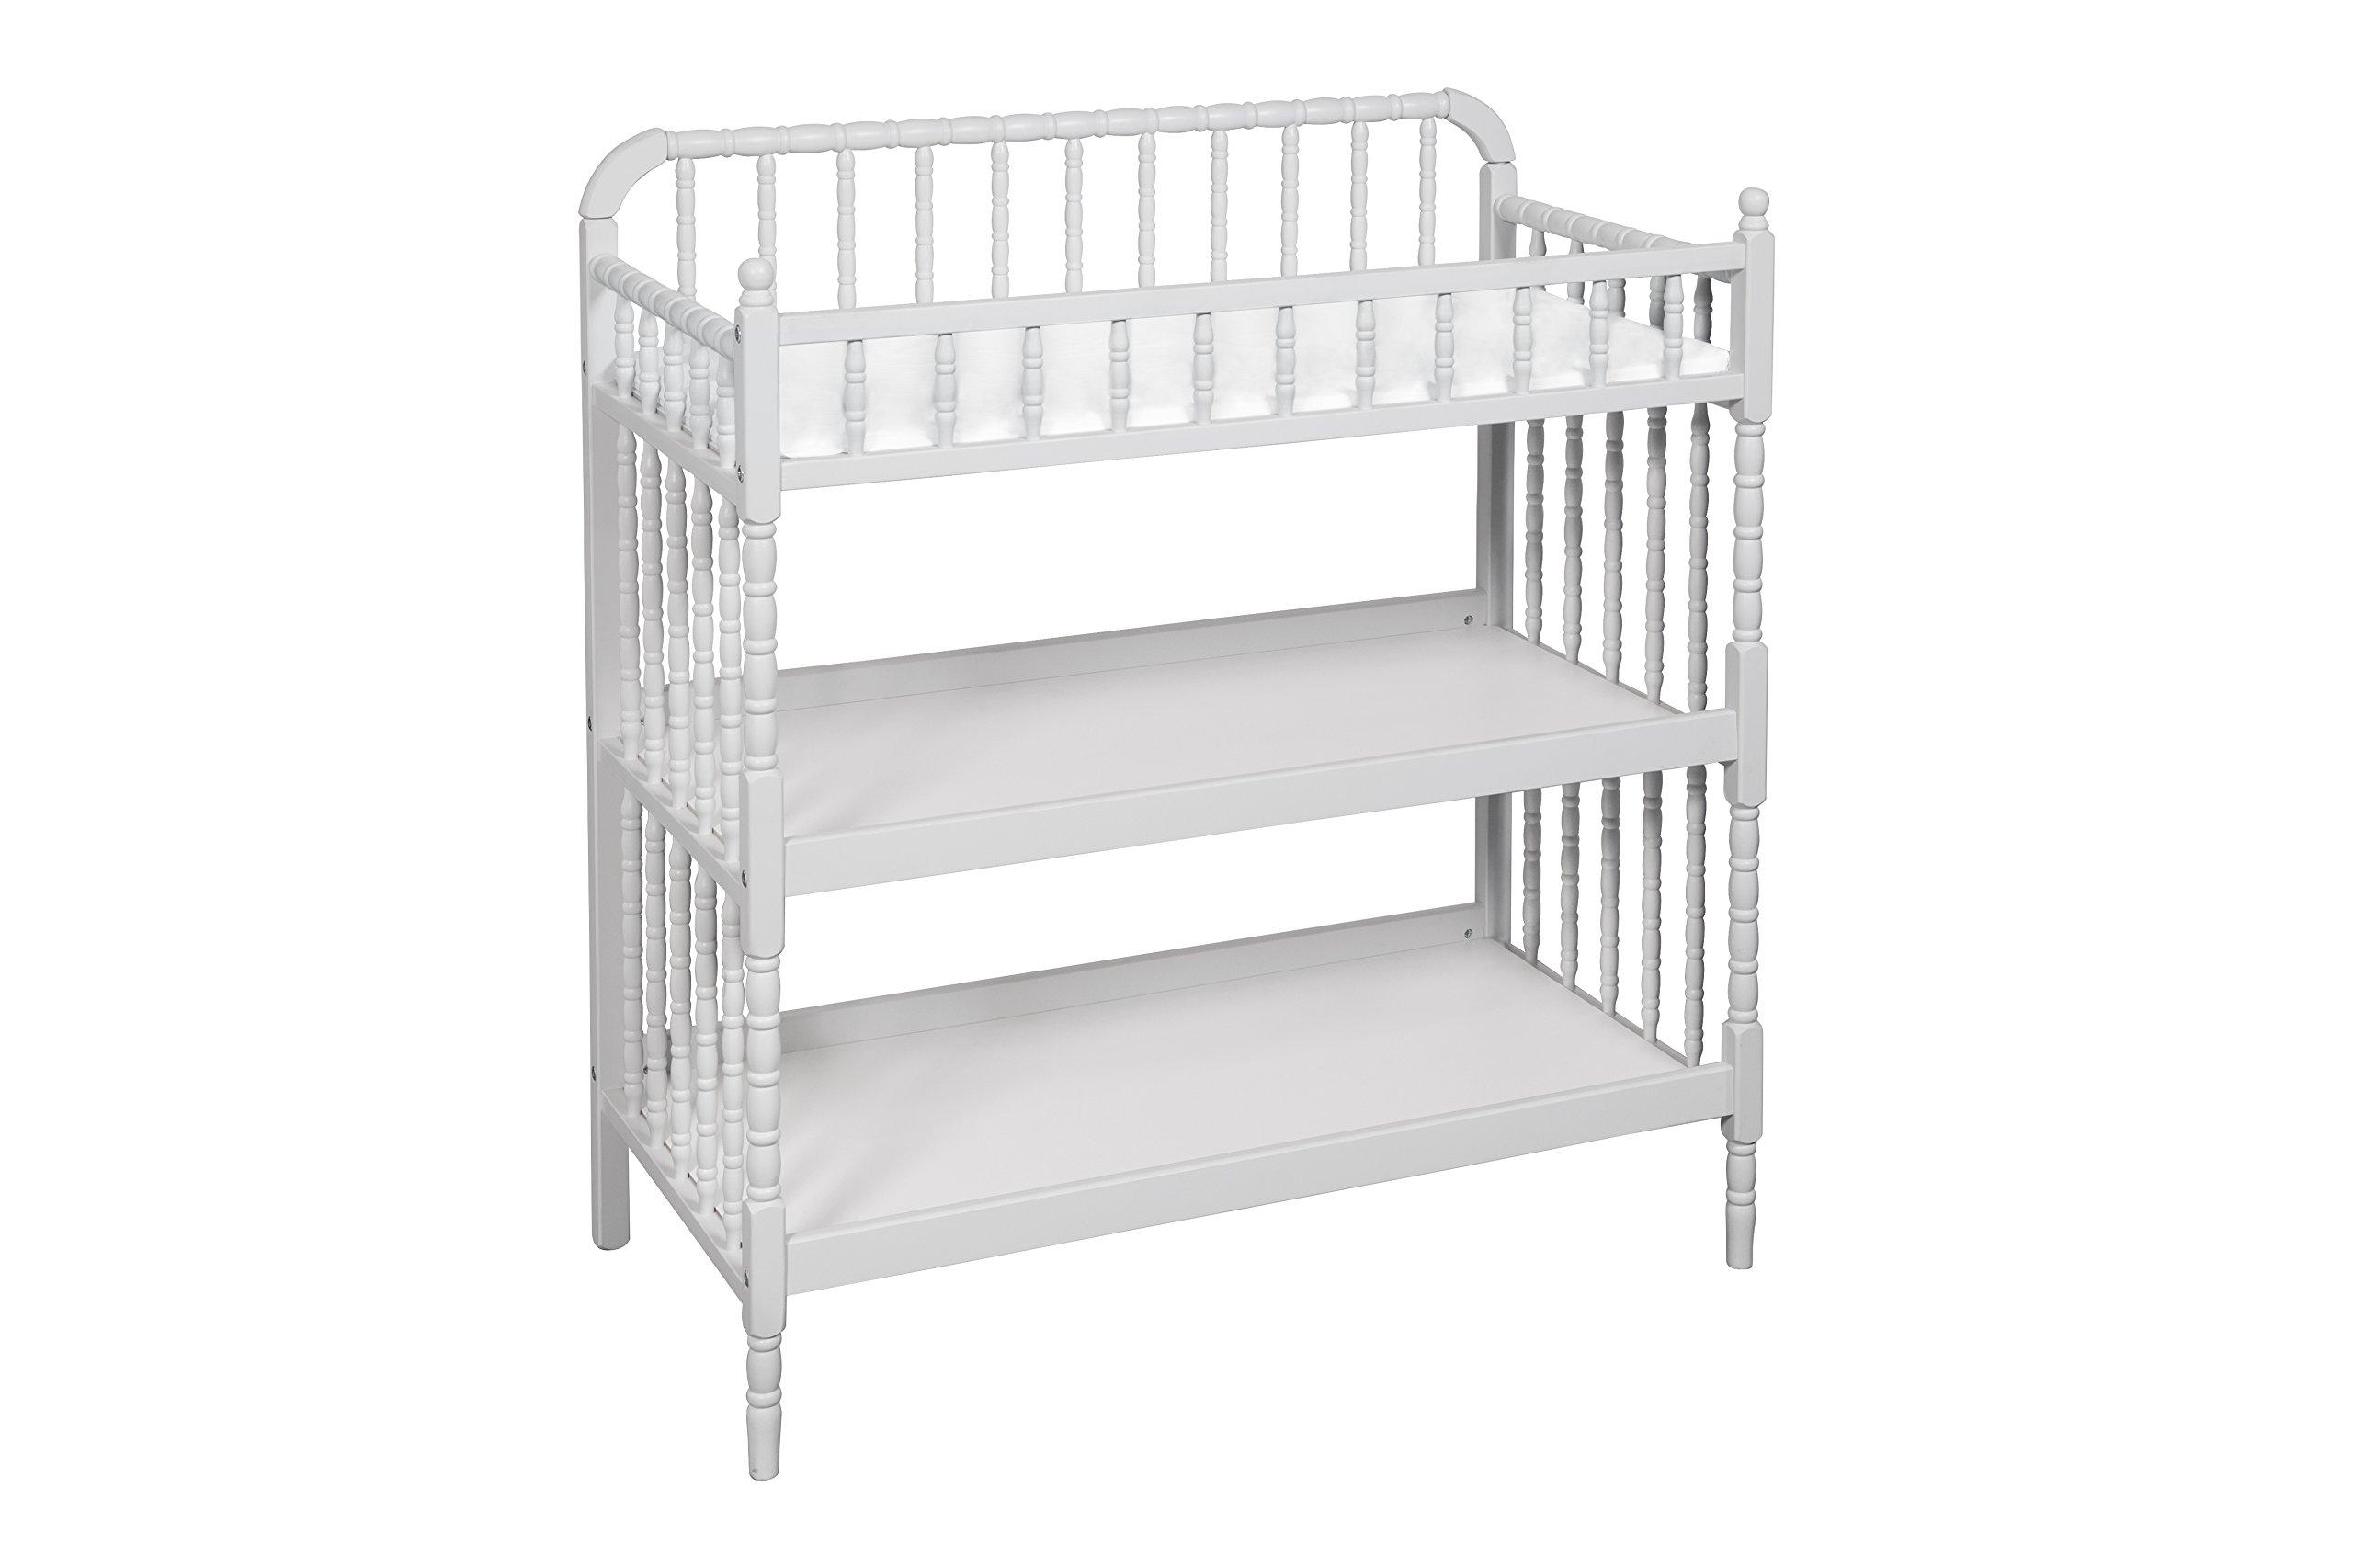 crib carter jenny davinci white background convertible baby main s lind in nolan cribs